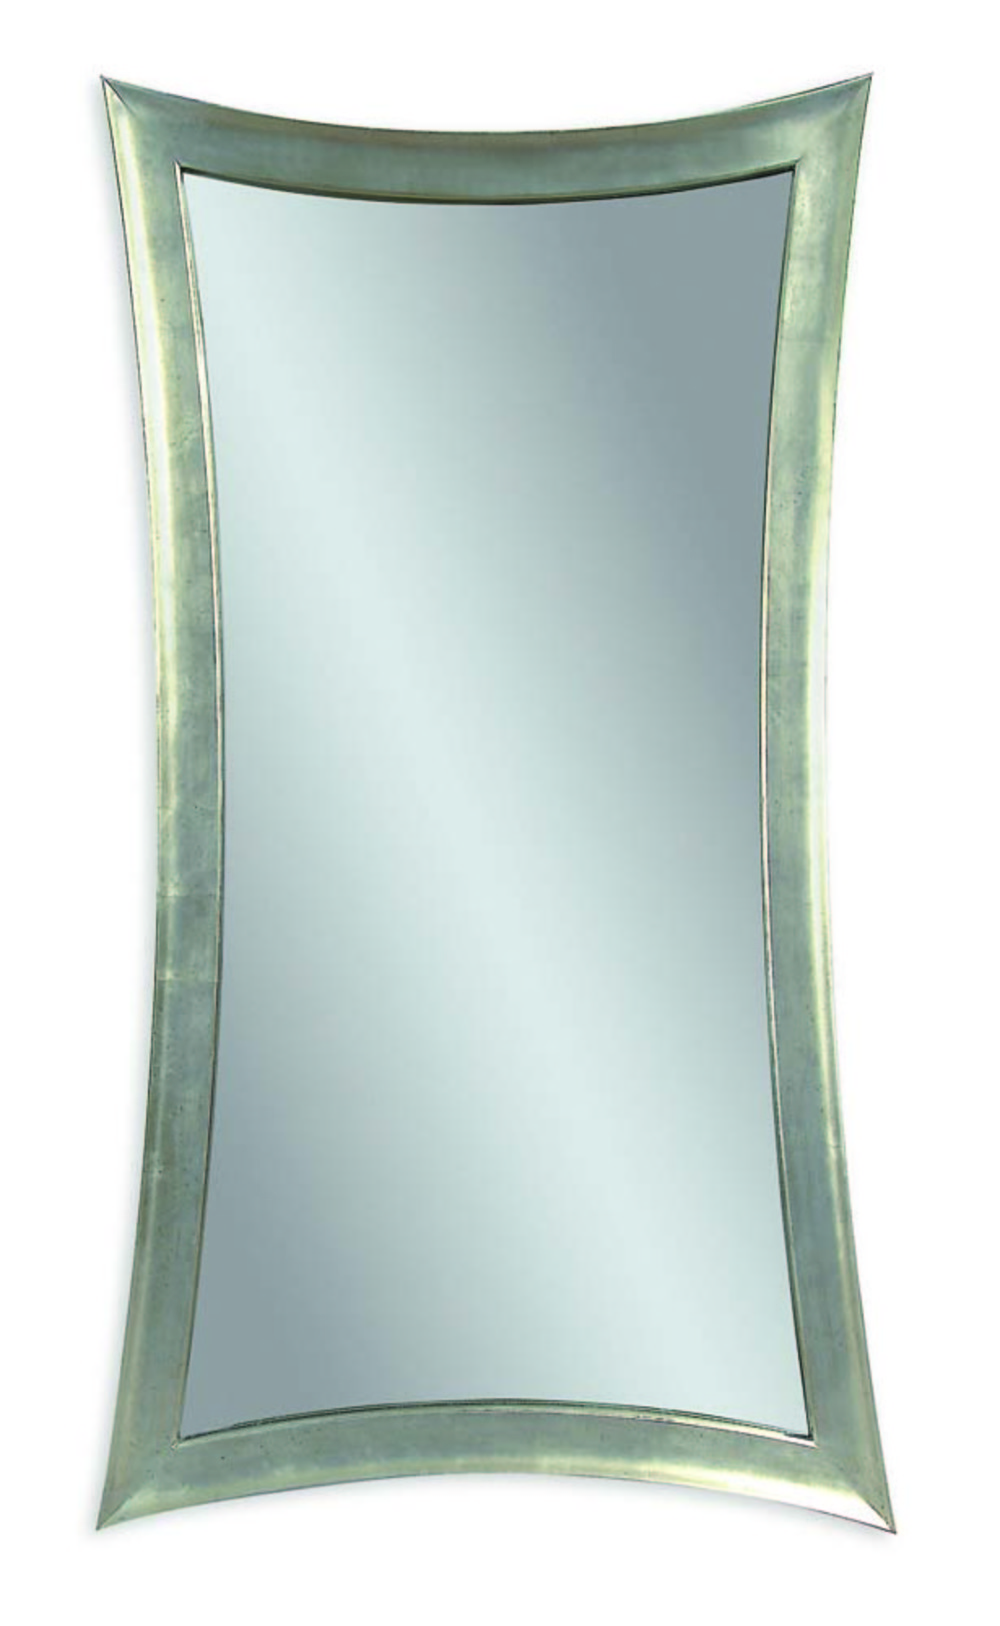 Bassett Mirror Company - Hourglass Wall Mirror